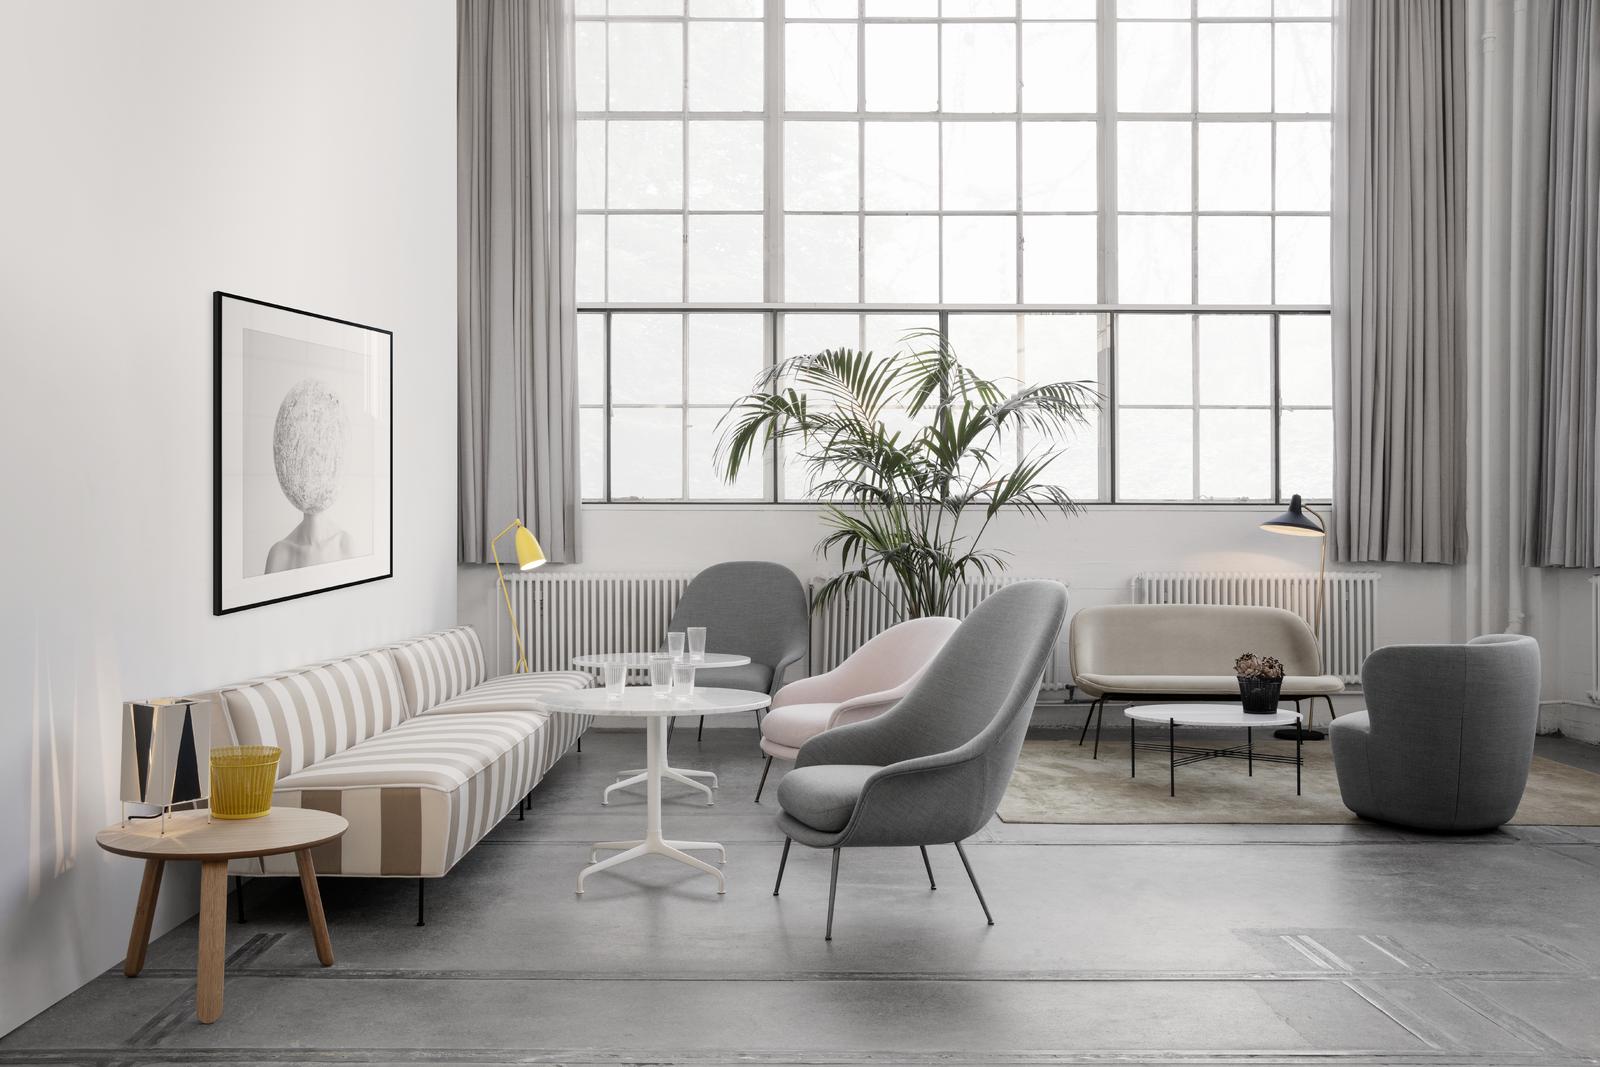 Gubi Modern Line Sofa By Greta M Grossman Paper Table